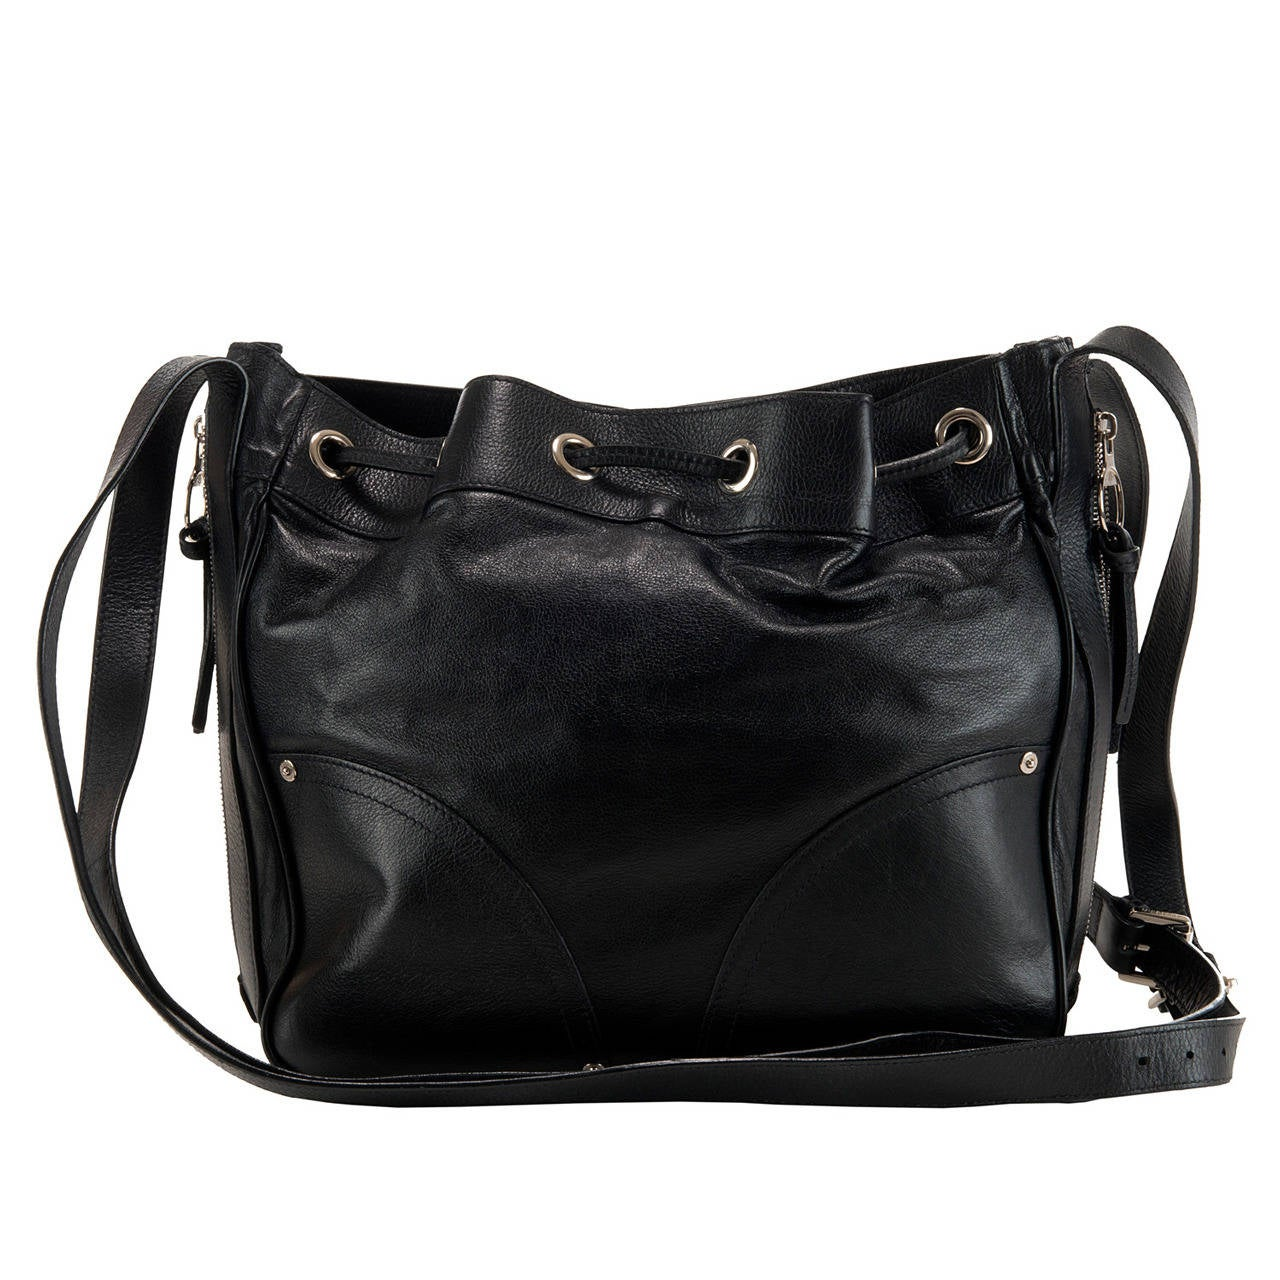 Super Large Black Shoulder/Crossbody or Travel Bag by Mulberry of ...